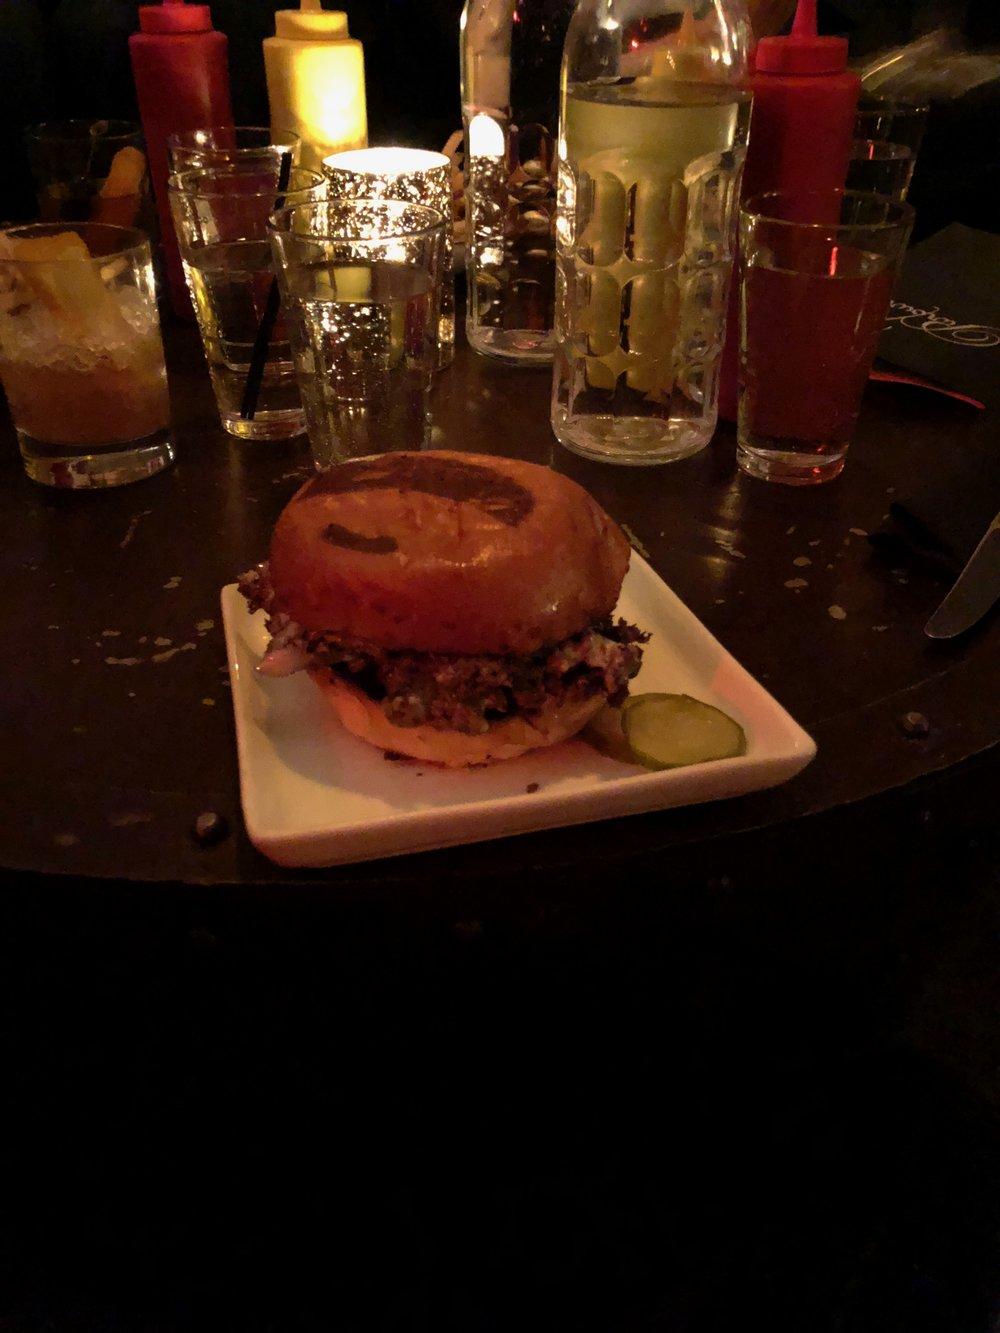 The Parlour Burger